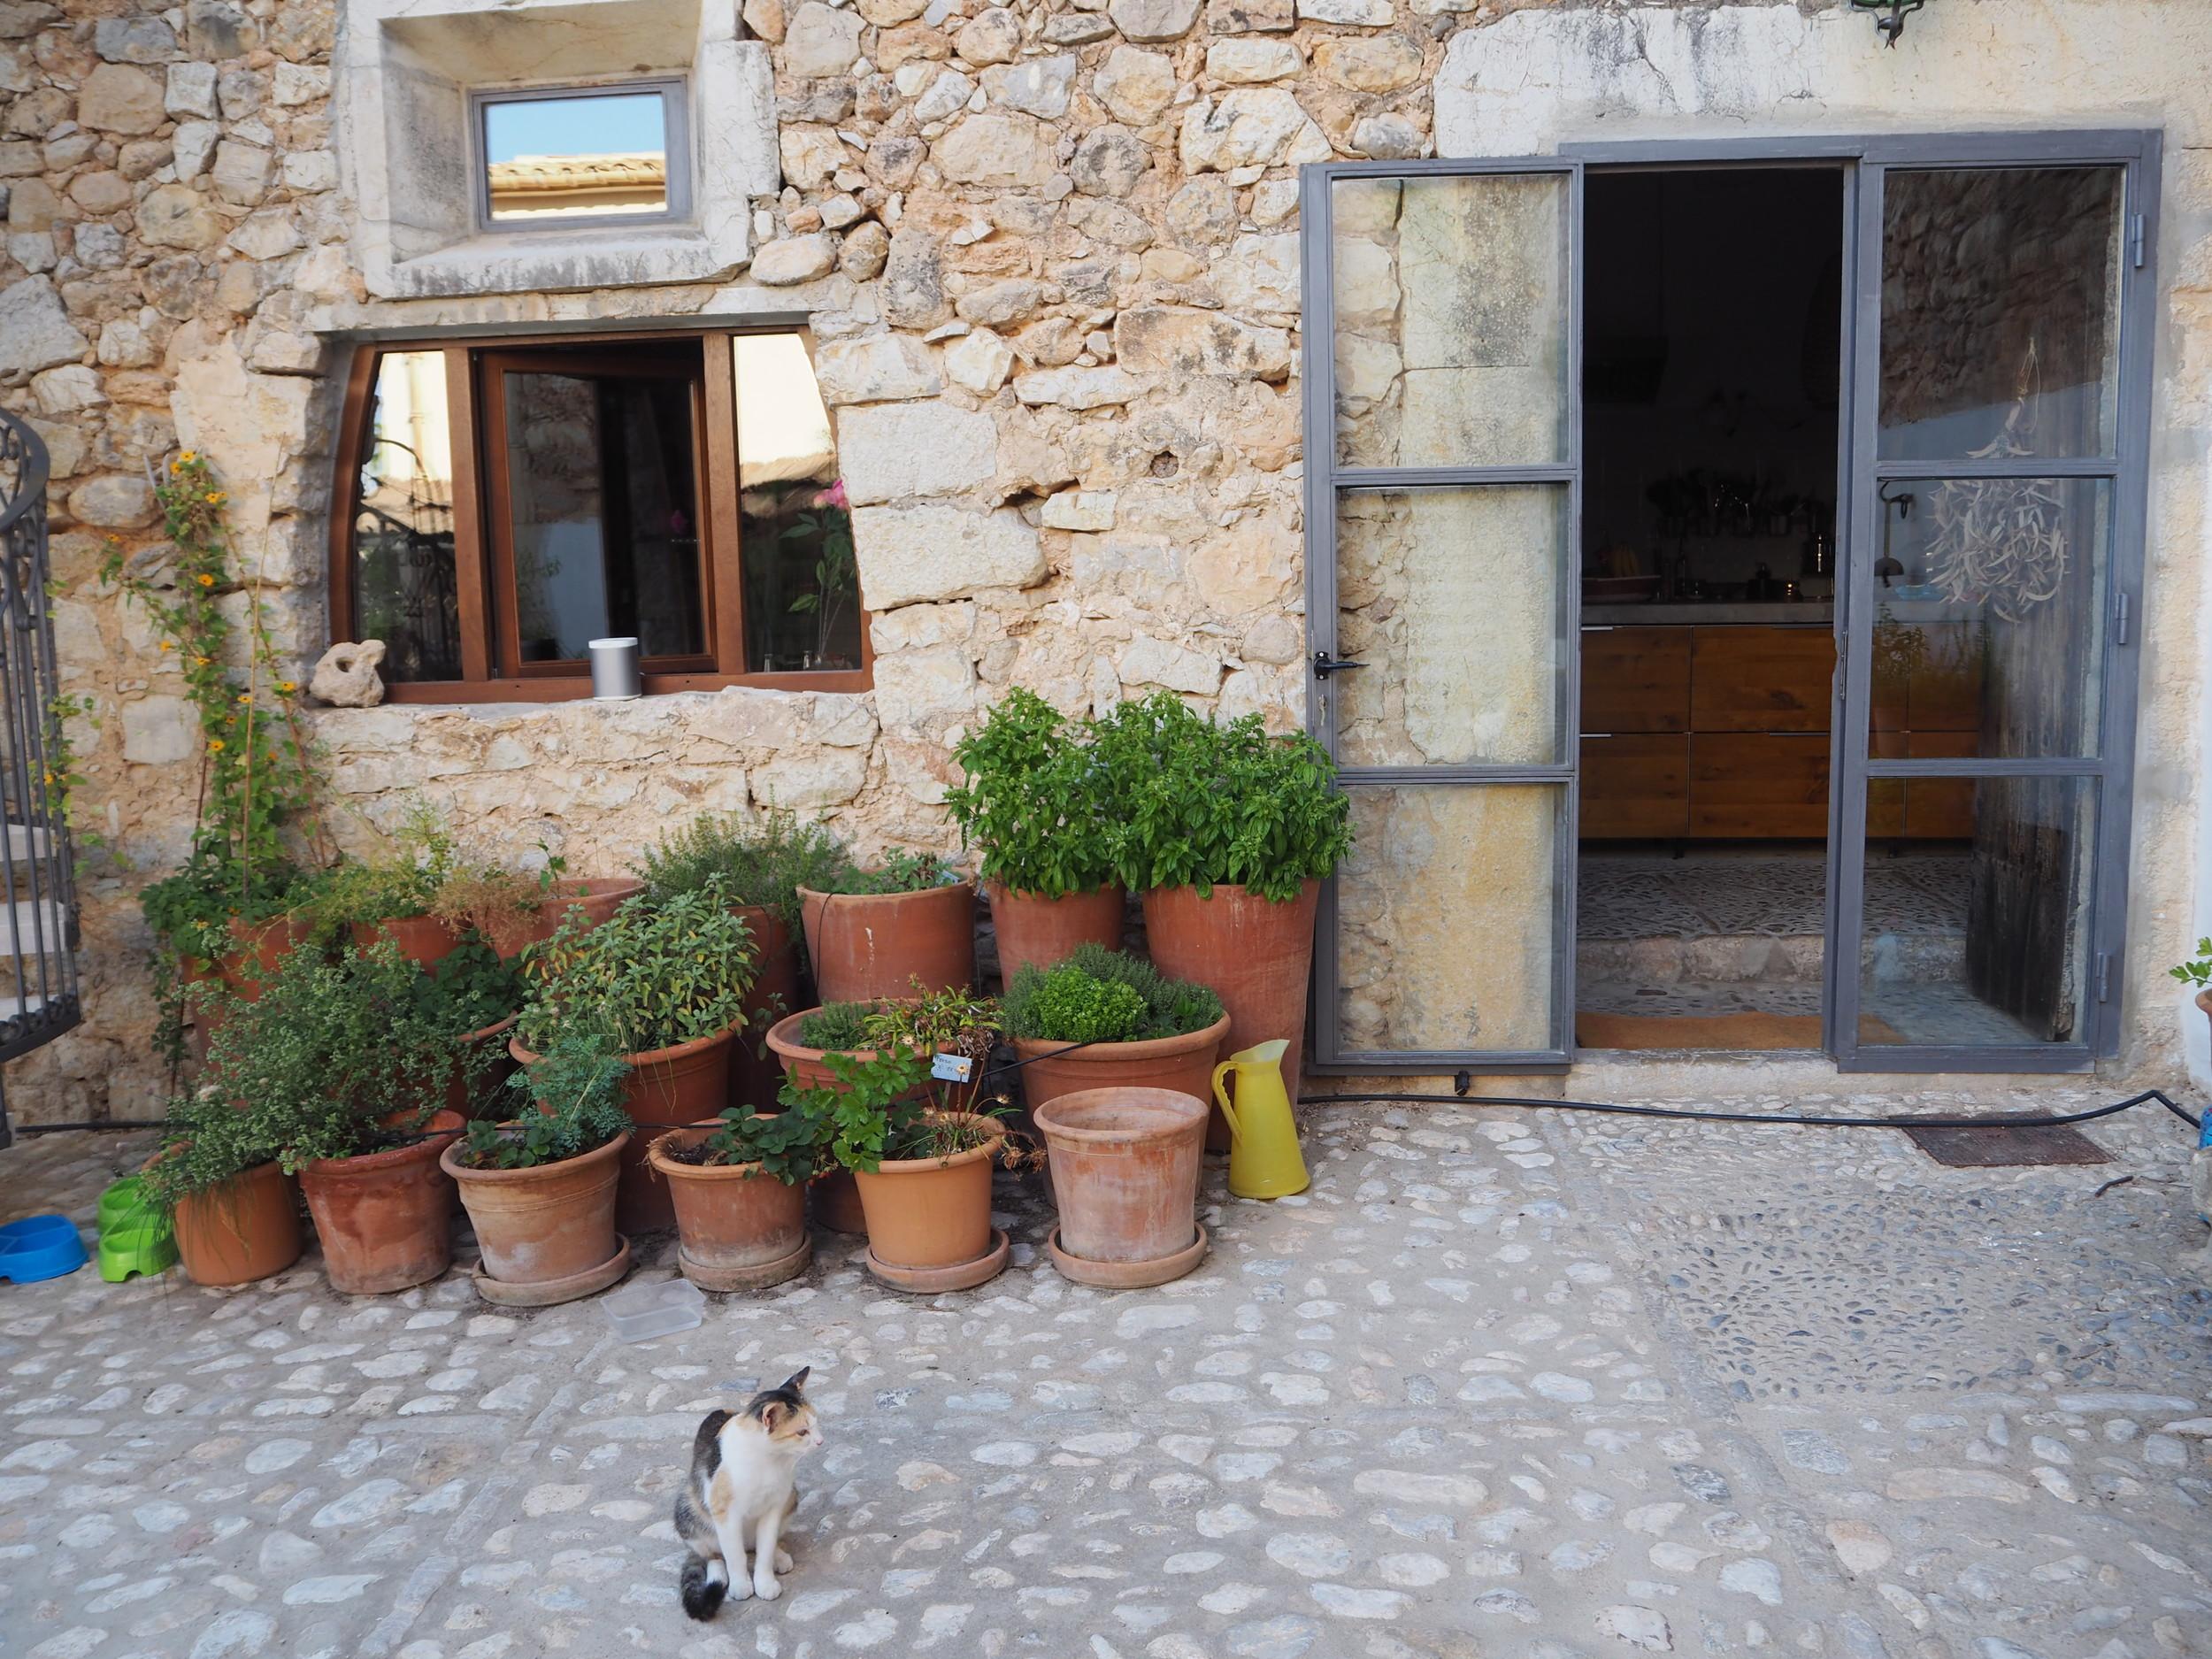 The outside courtyard at The pink Pepper Tree Hotel- Lloseta, Majoraca. A traditional Majorcan finca.